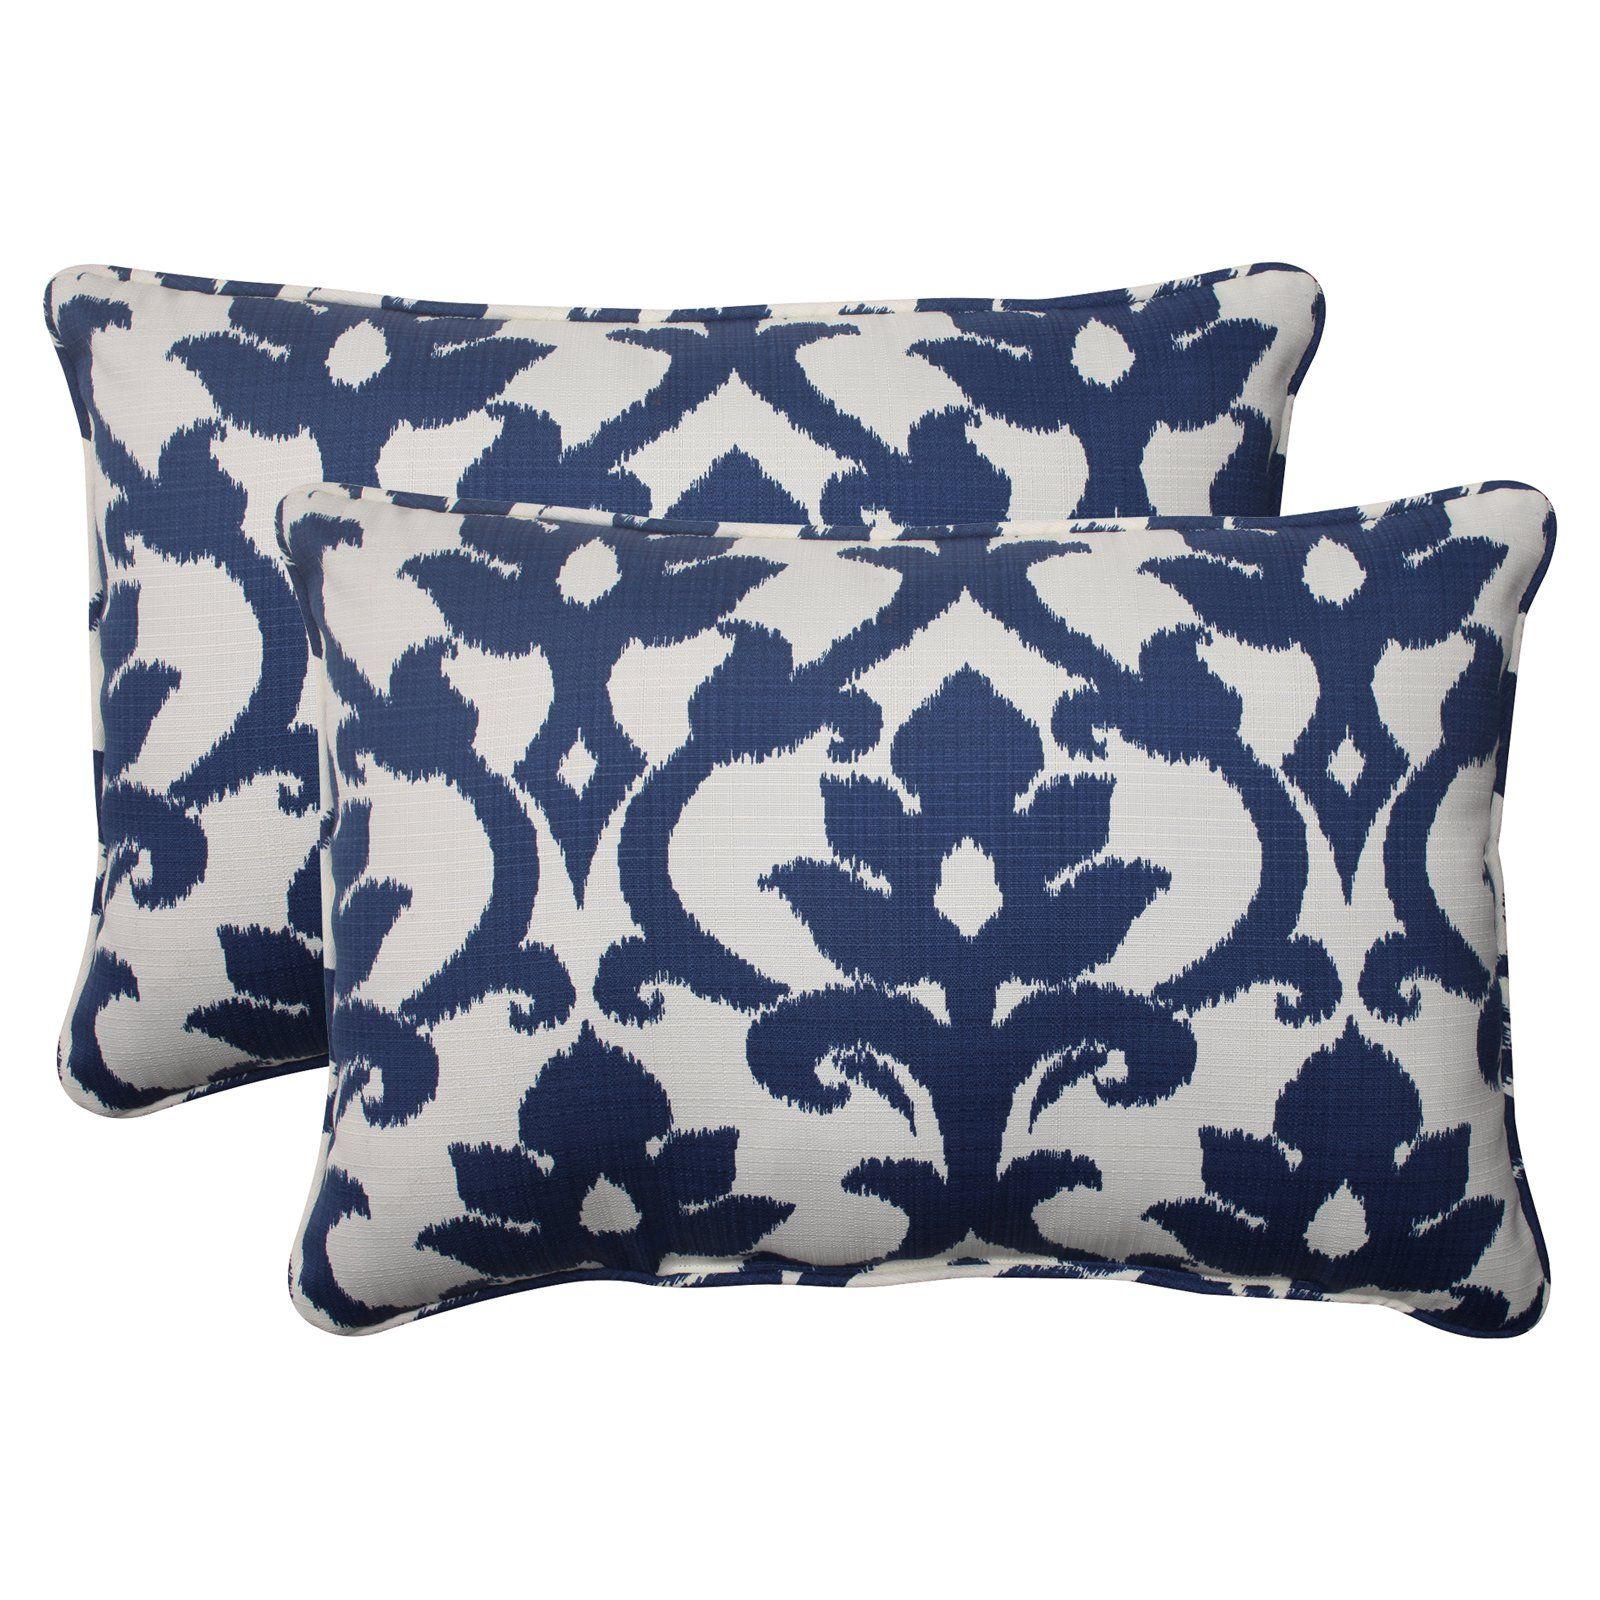 Pillow Perfect Bosco Oversized Rectangle Throw Pillow Set Of 2 Www Hayneedle Com Outdoor Throw Pillows Rectangular Pillow Cover Perfect Pillow